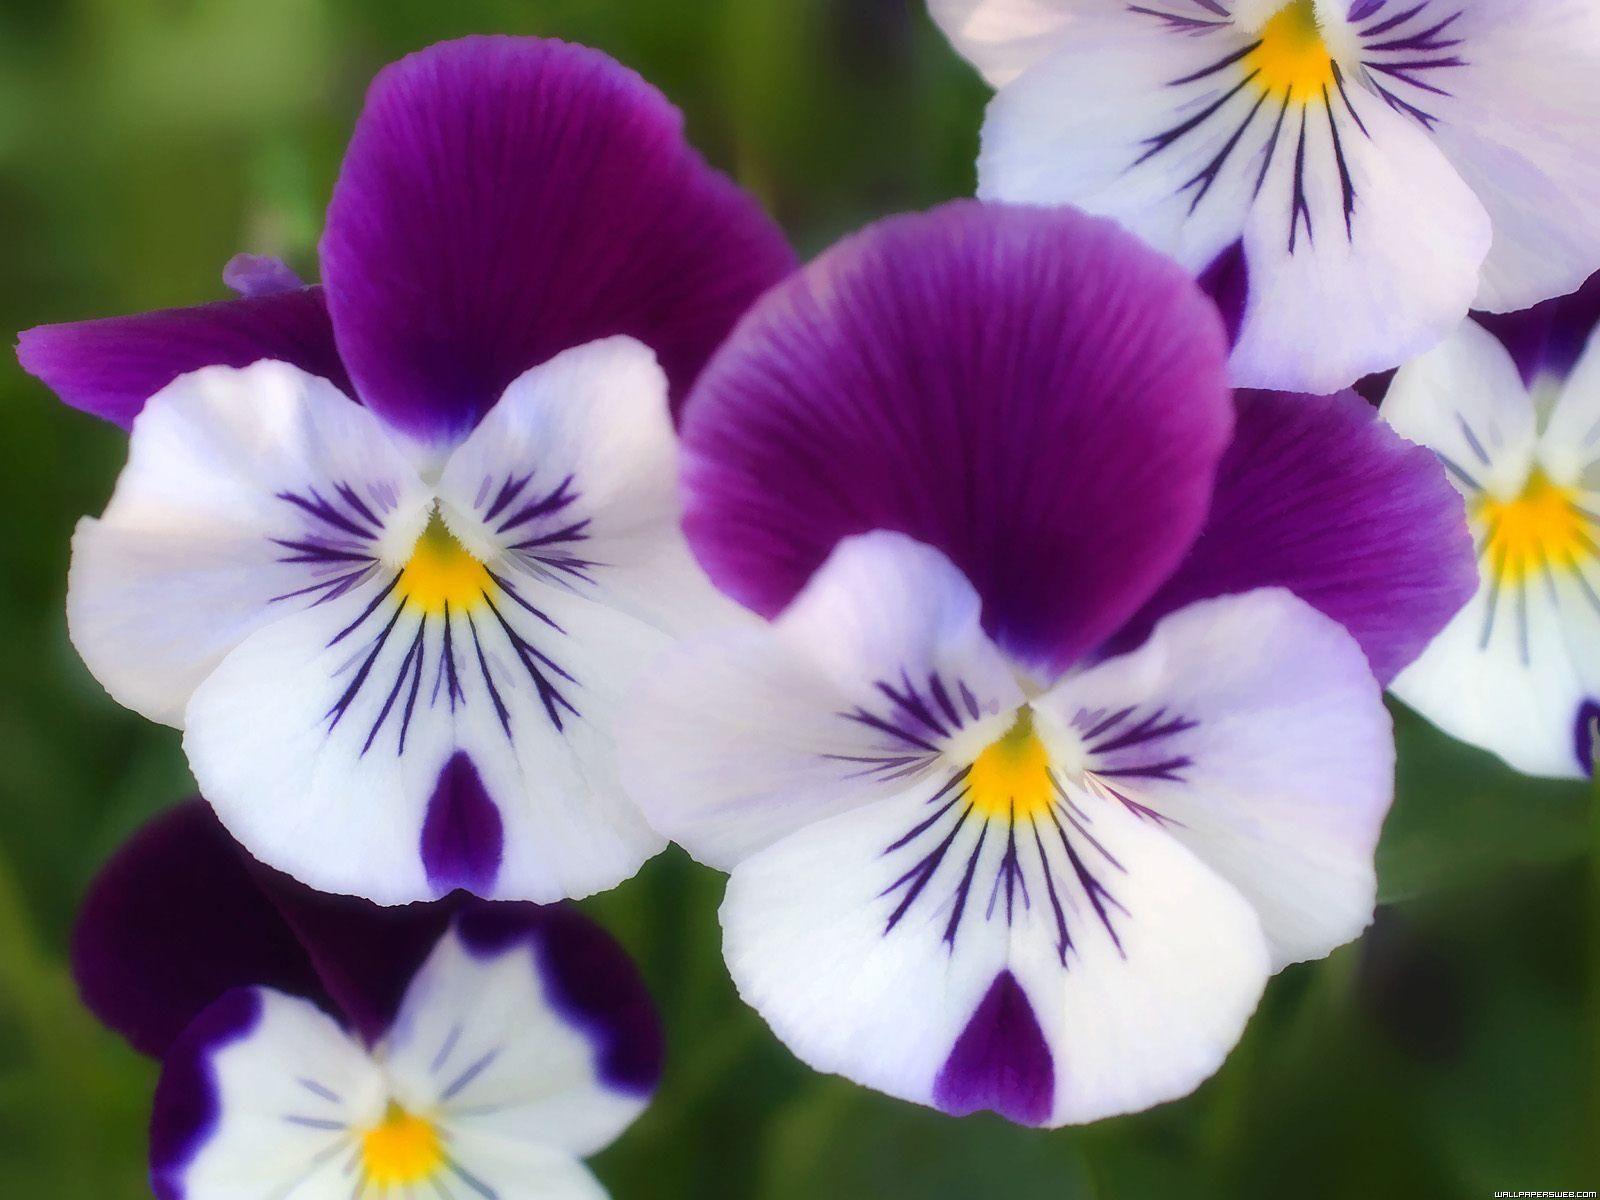 Pansys Pansies Beautiful Flowers Photos Beautiful Flowers Hd Wallpapers Beautiful Flowers Pictures